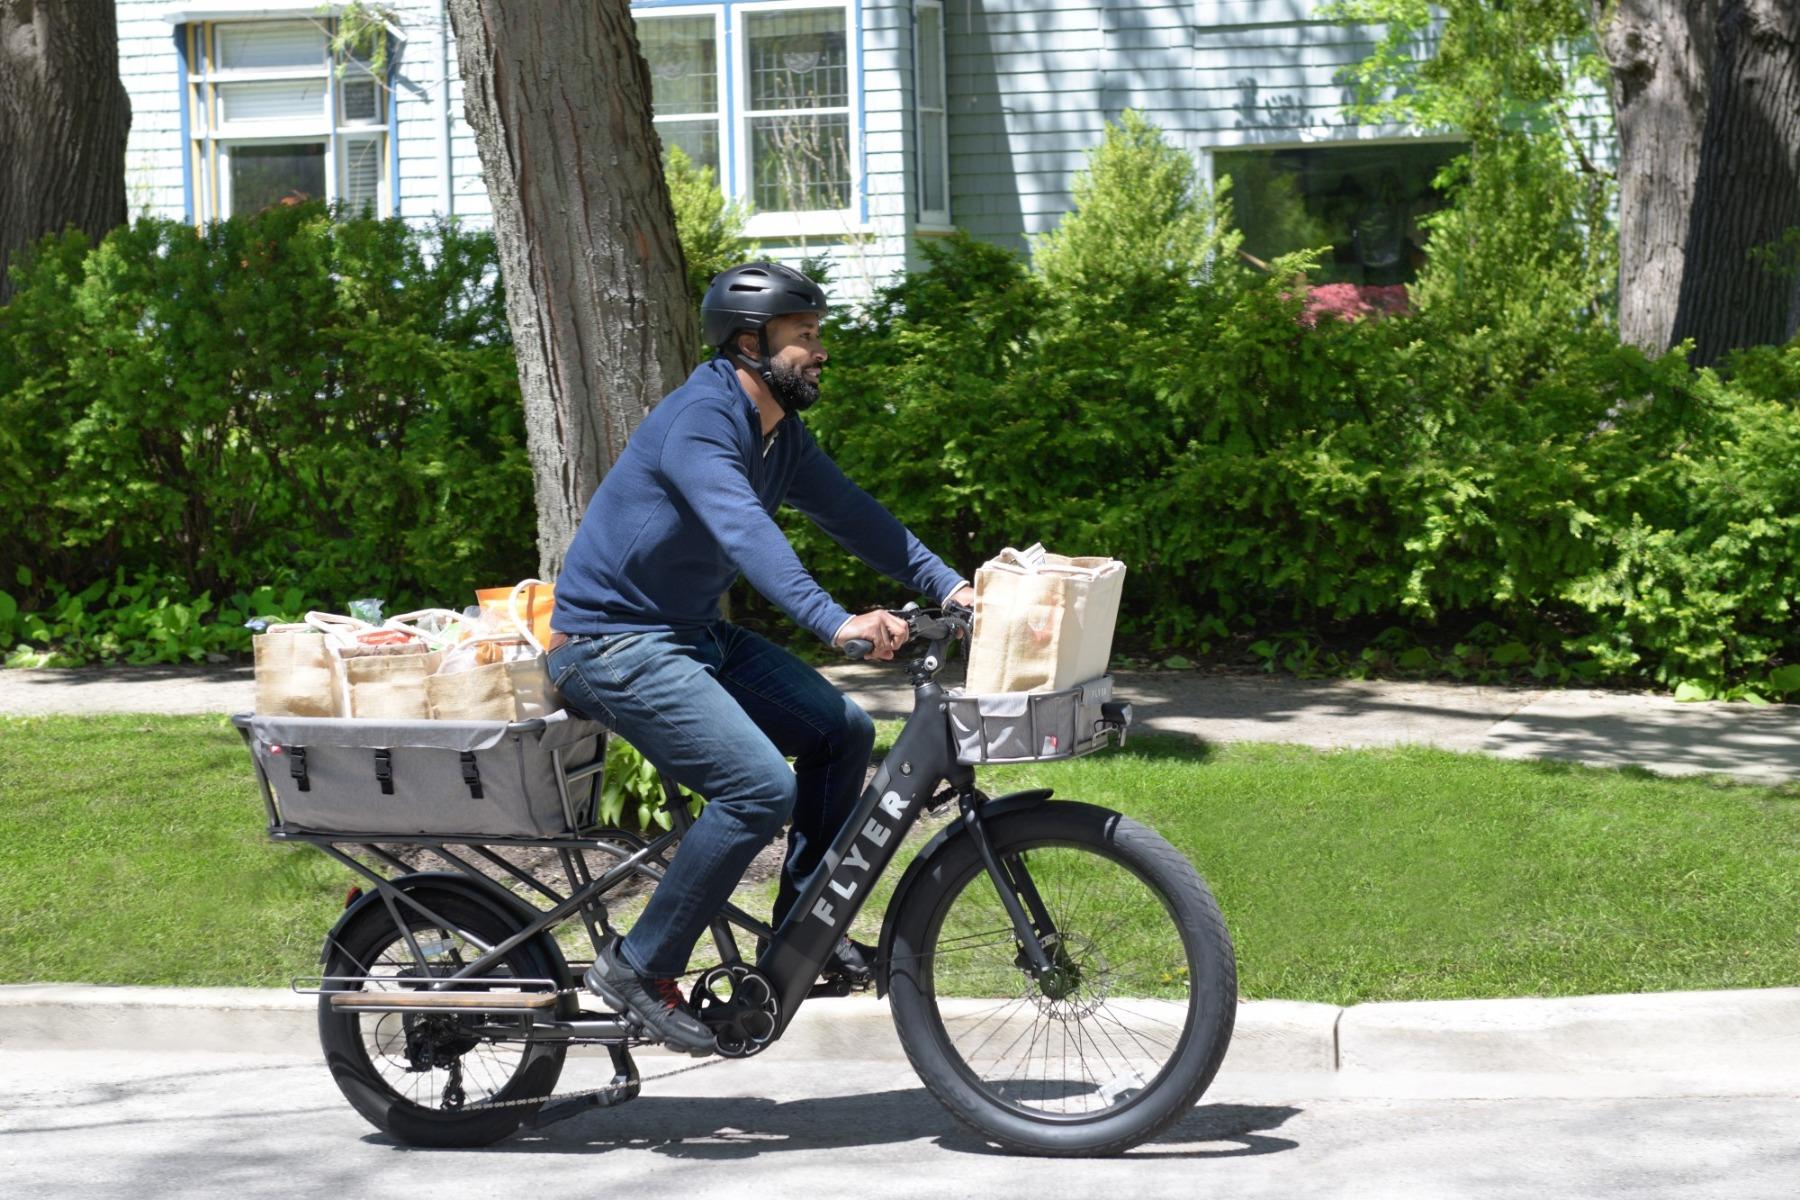 Man riding Flyer L885 black electric bike through suburban street with groceries